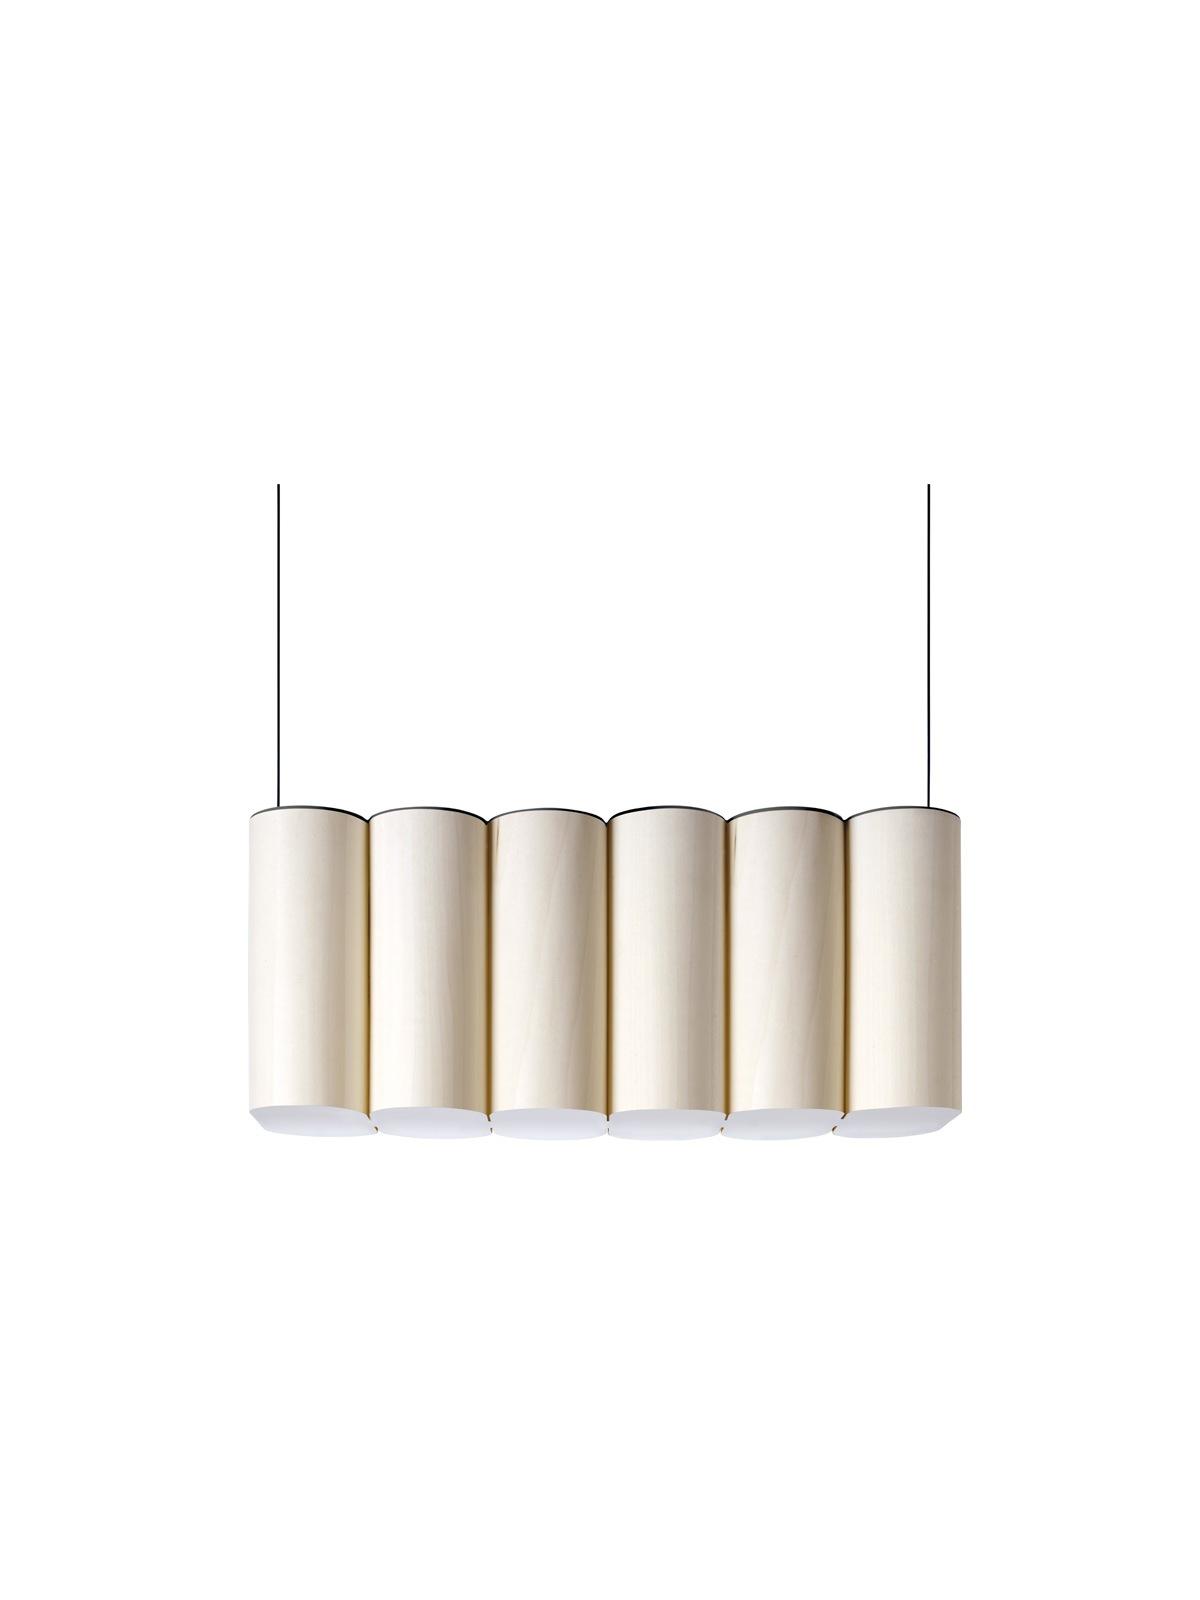 Tomo Lang LZF Lamps Designort Leuchten Berlin